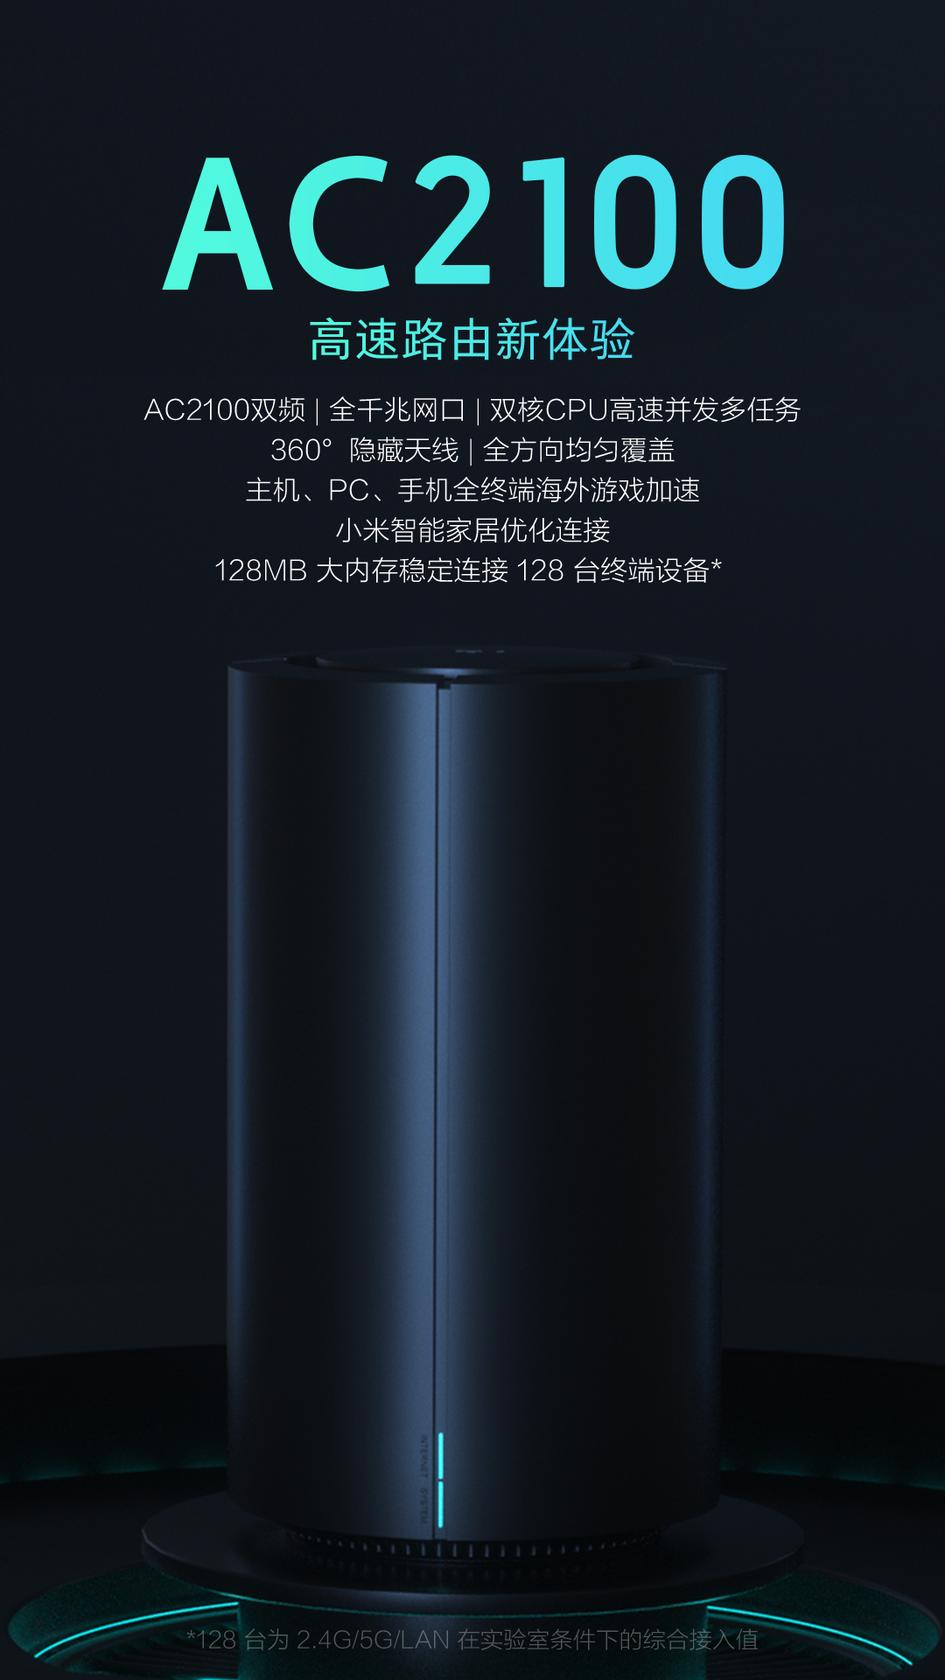 Xiaomi officially announces AC2100 Wi-Fi router